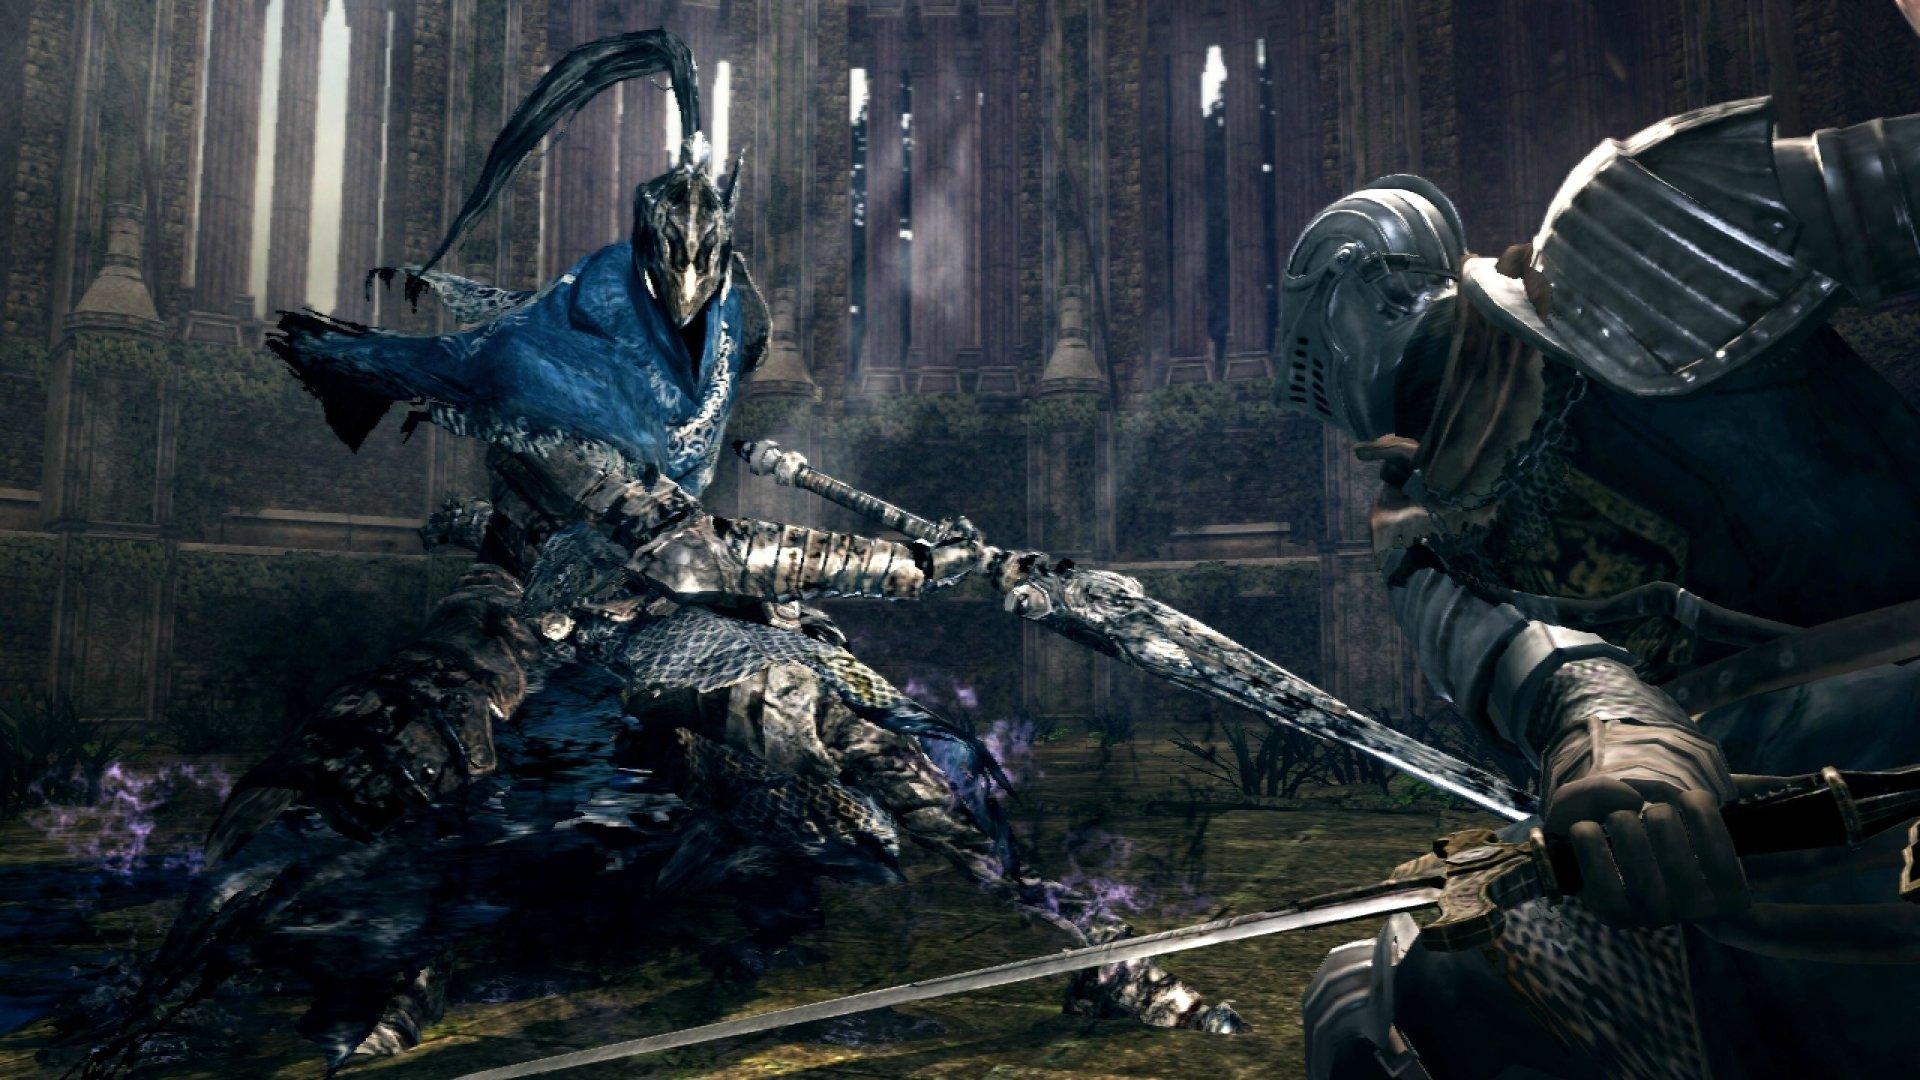 Video Game - Dark Souls  Artorias (Dark Souls) Artorias Of The Abyss Wallpaper